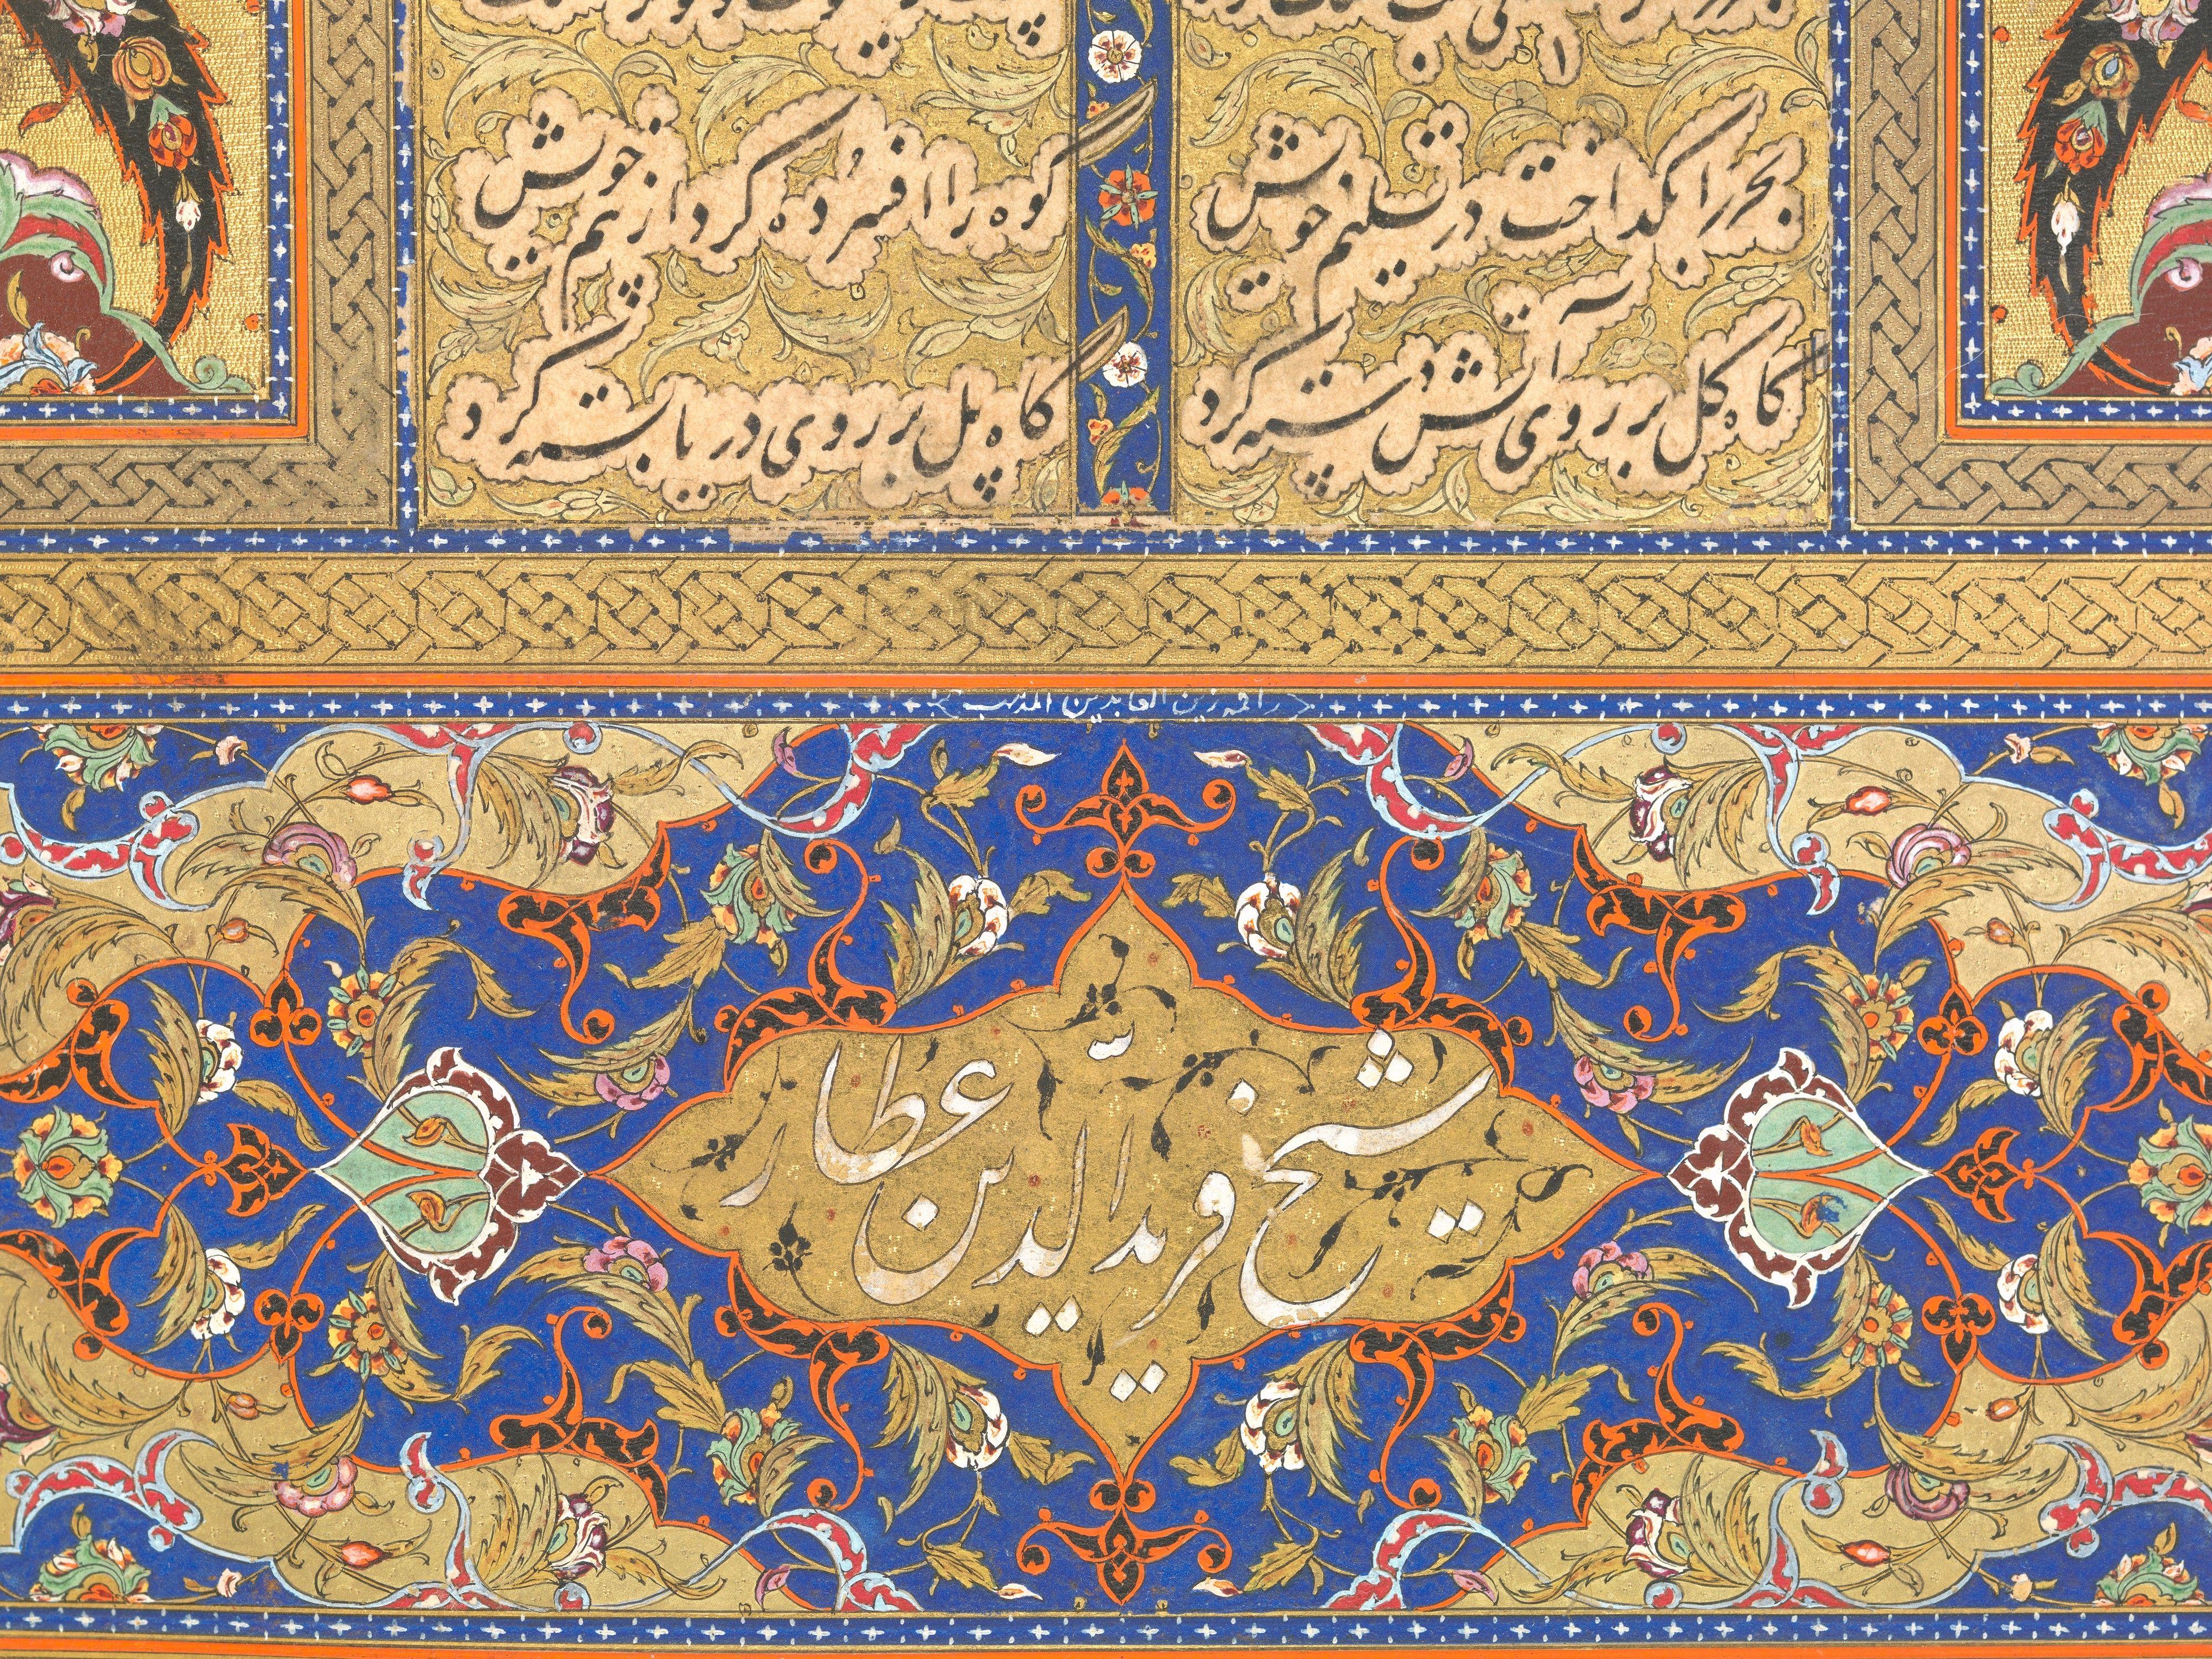 Mantiq Al Tair By Attar Detail Calligraphy 1487 Herat Timurid By Sultan Ali Al Mashhadi Illumination 1600 Isfahan Safavid By Zain Al Tezhip Drawing Sanat